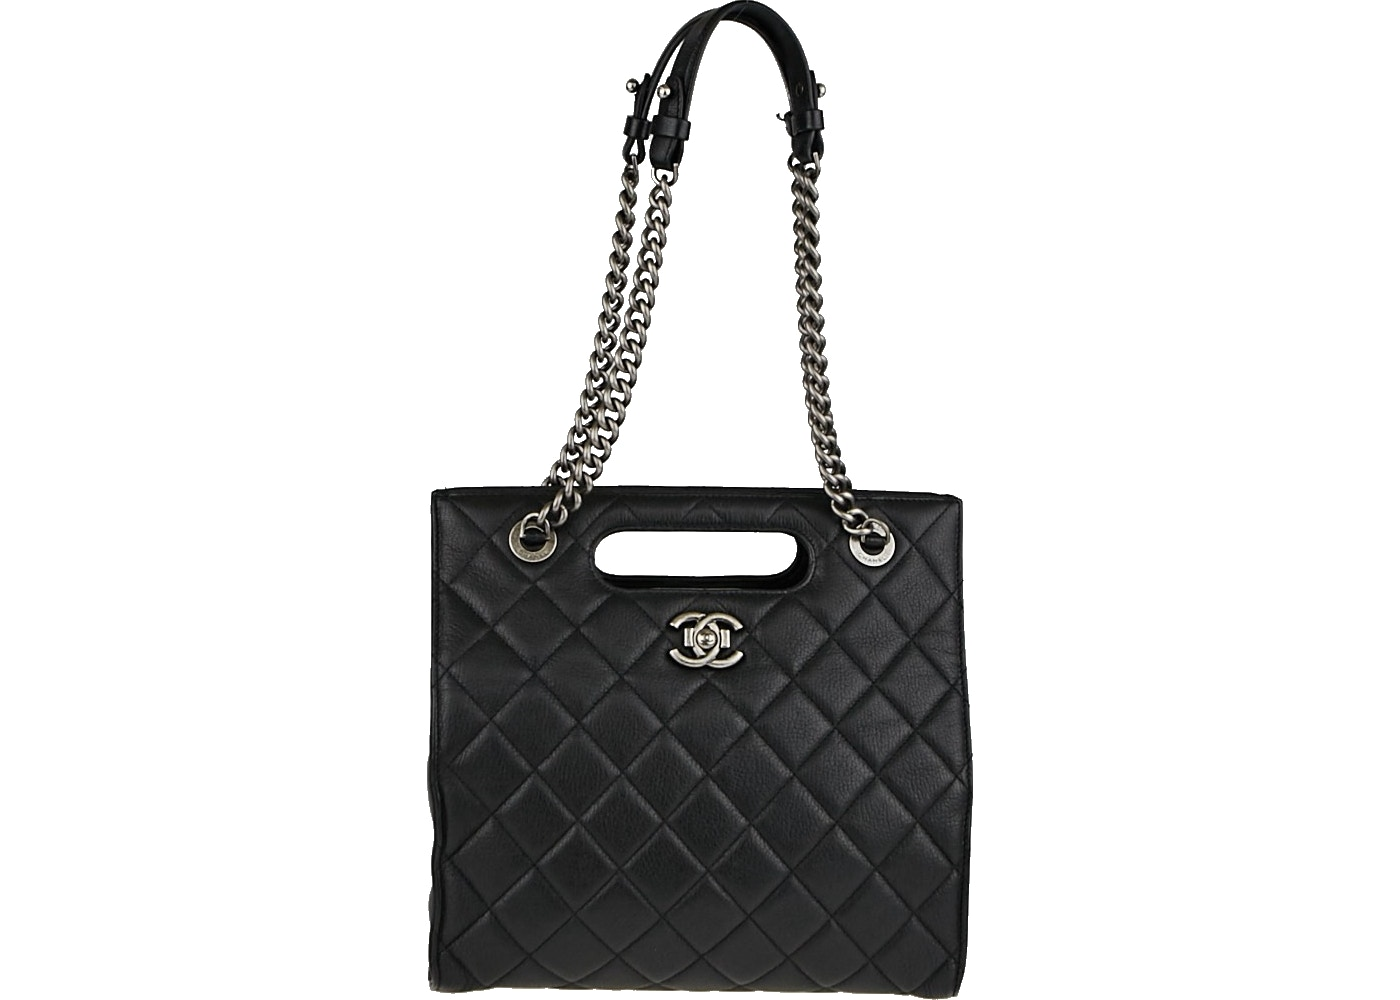 434001d87991 Buy & Sell Chanel Handbags - Volatility